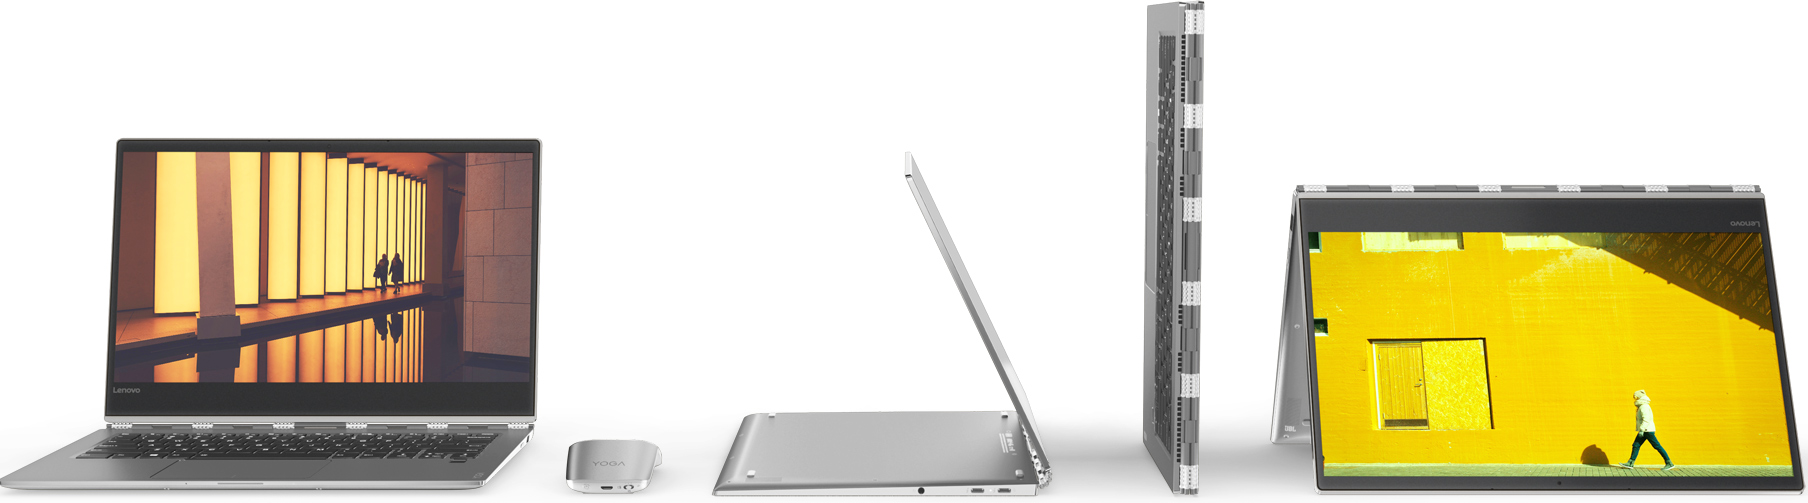 "Lenovo Launches Yoga 920 Convertible: 13 9"" 4K LCD, 8th Gen"